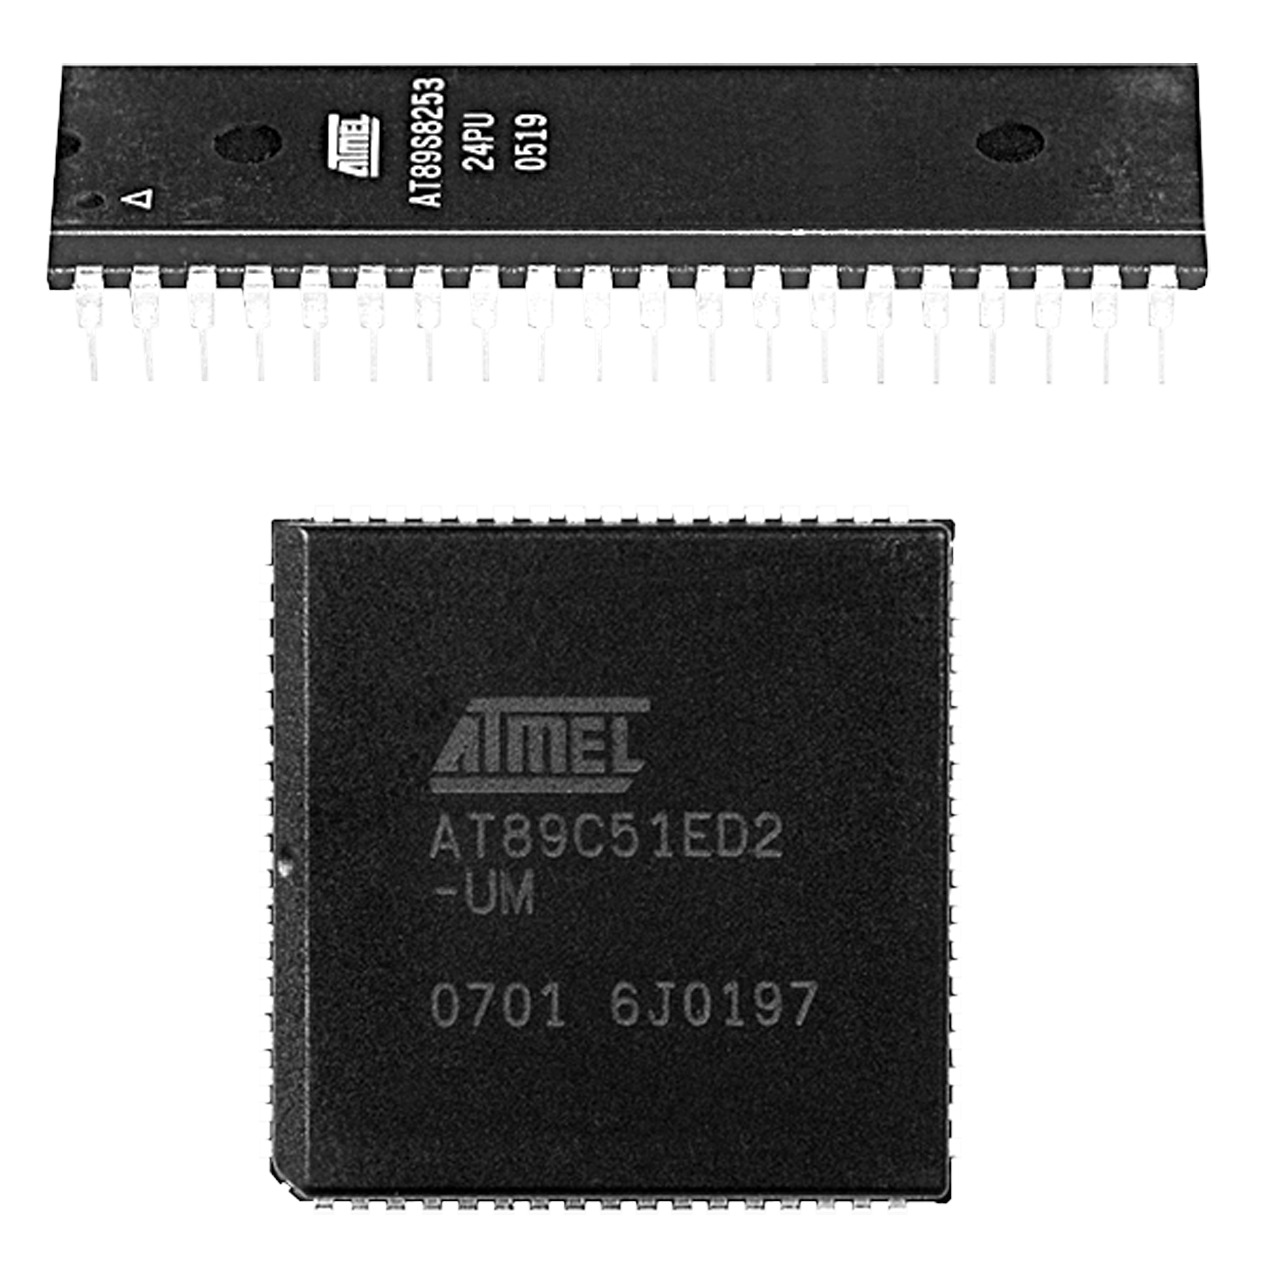 Image of Atmel Mikrocontroller AT89C51CC03CA-SL, PLCC44